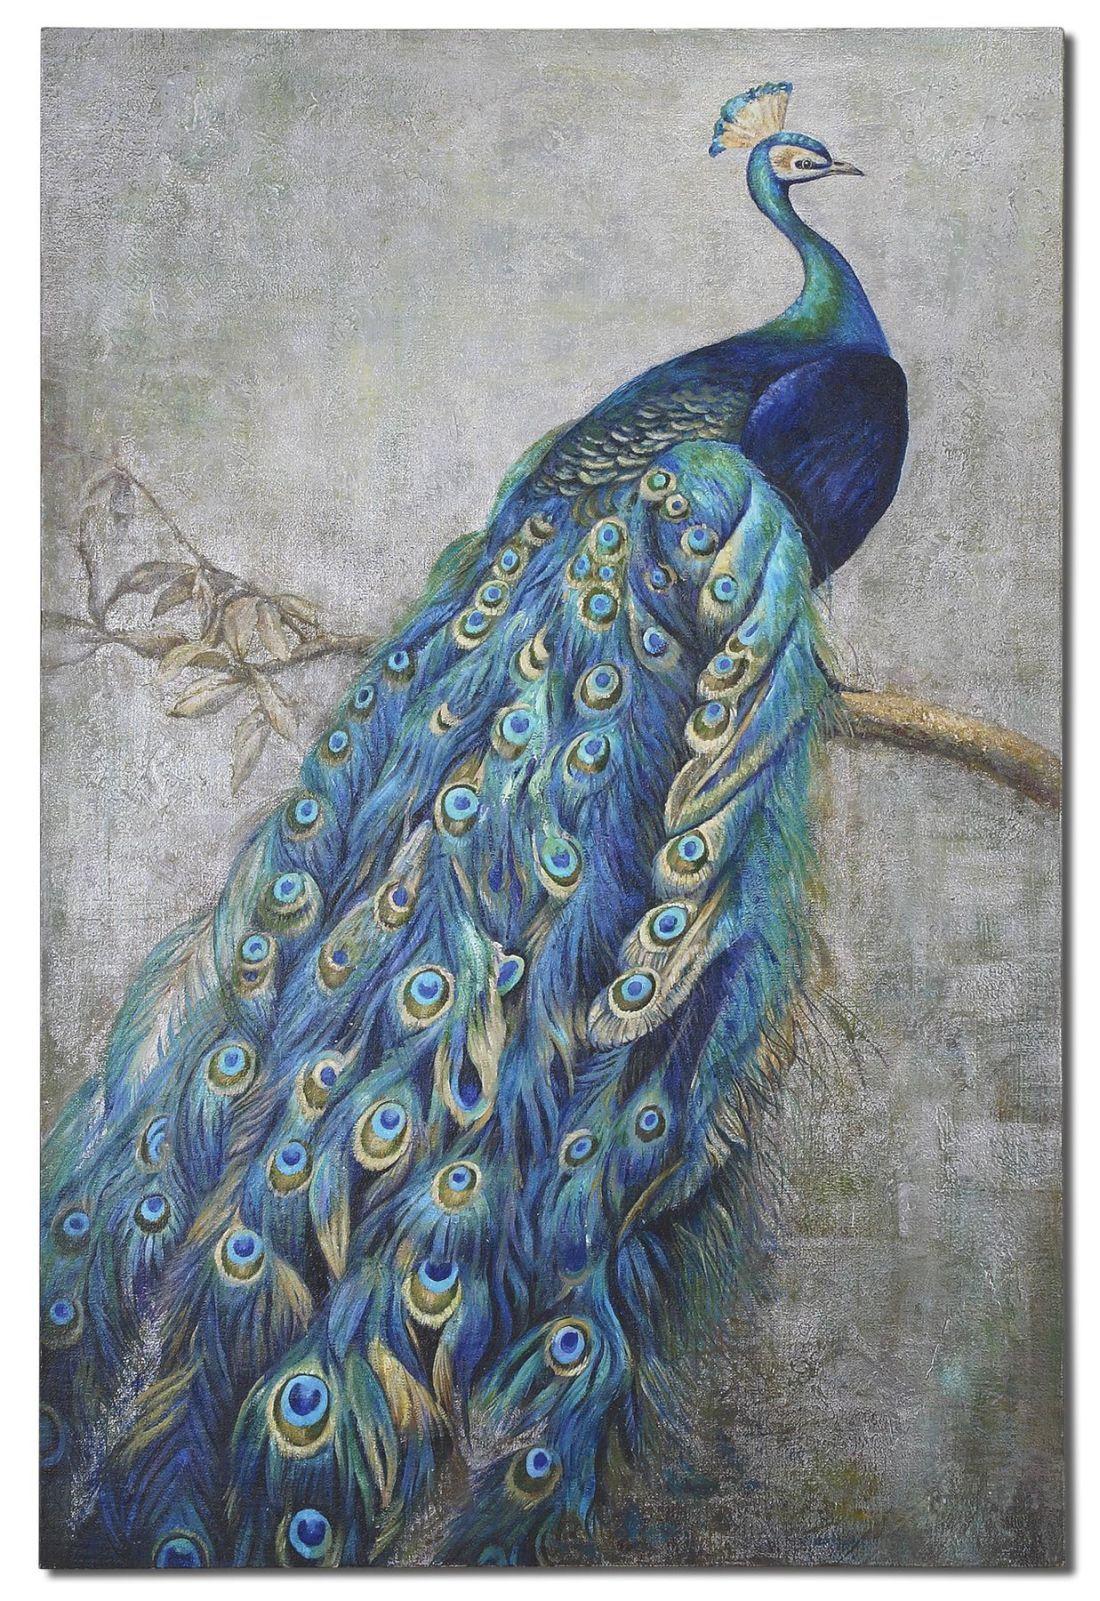 2e1f32e31b Proud Papa Hand Painted Art | Nature Illustrated 1 | Peacock wall ...